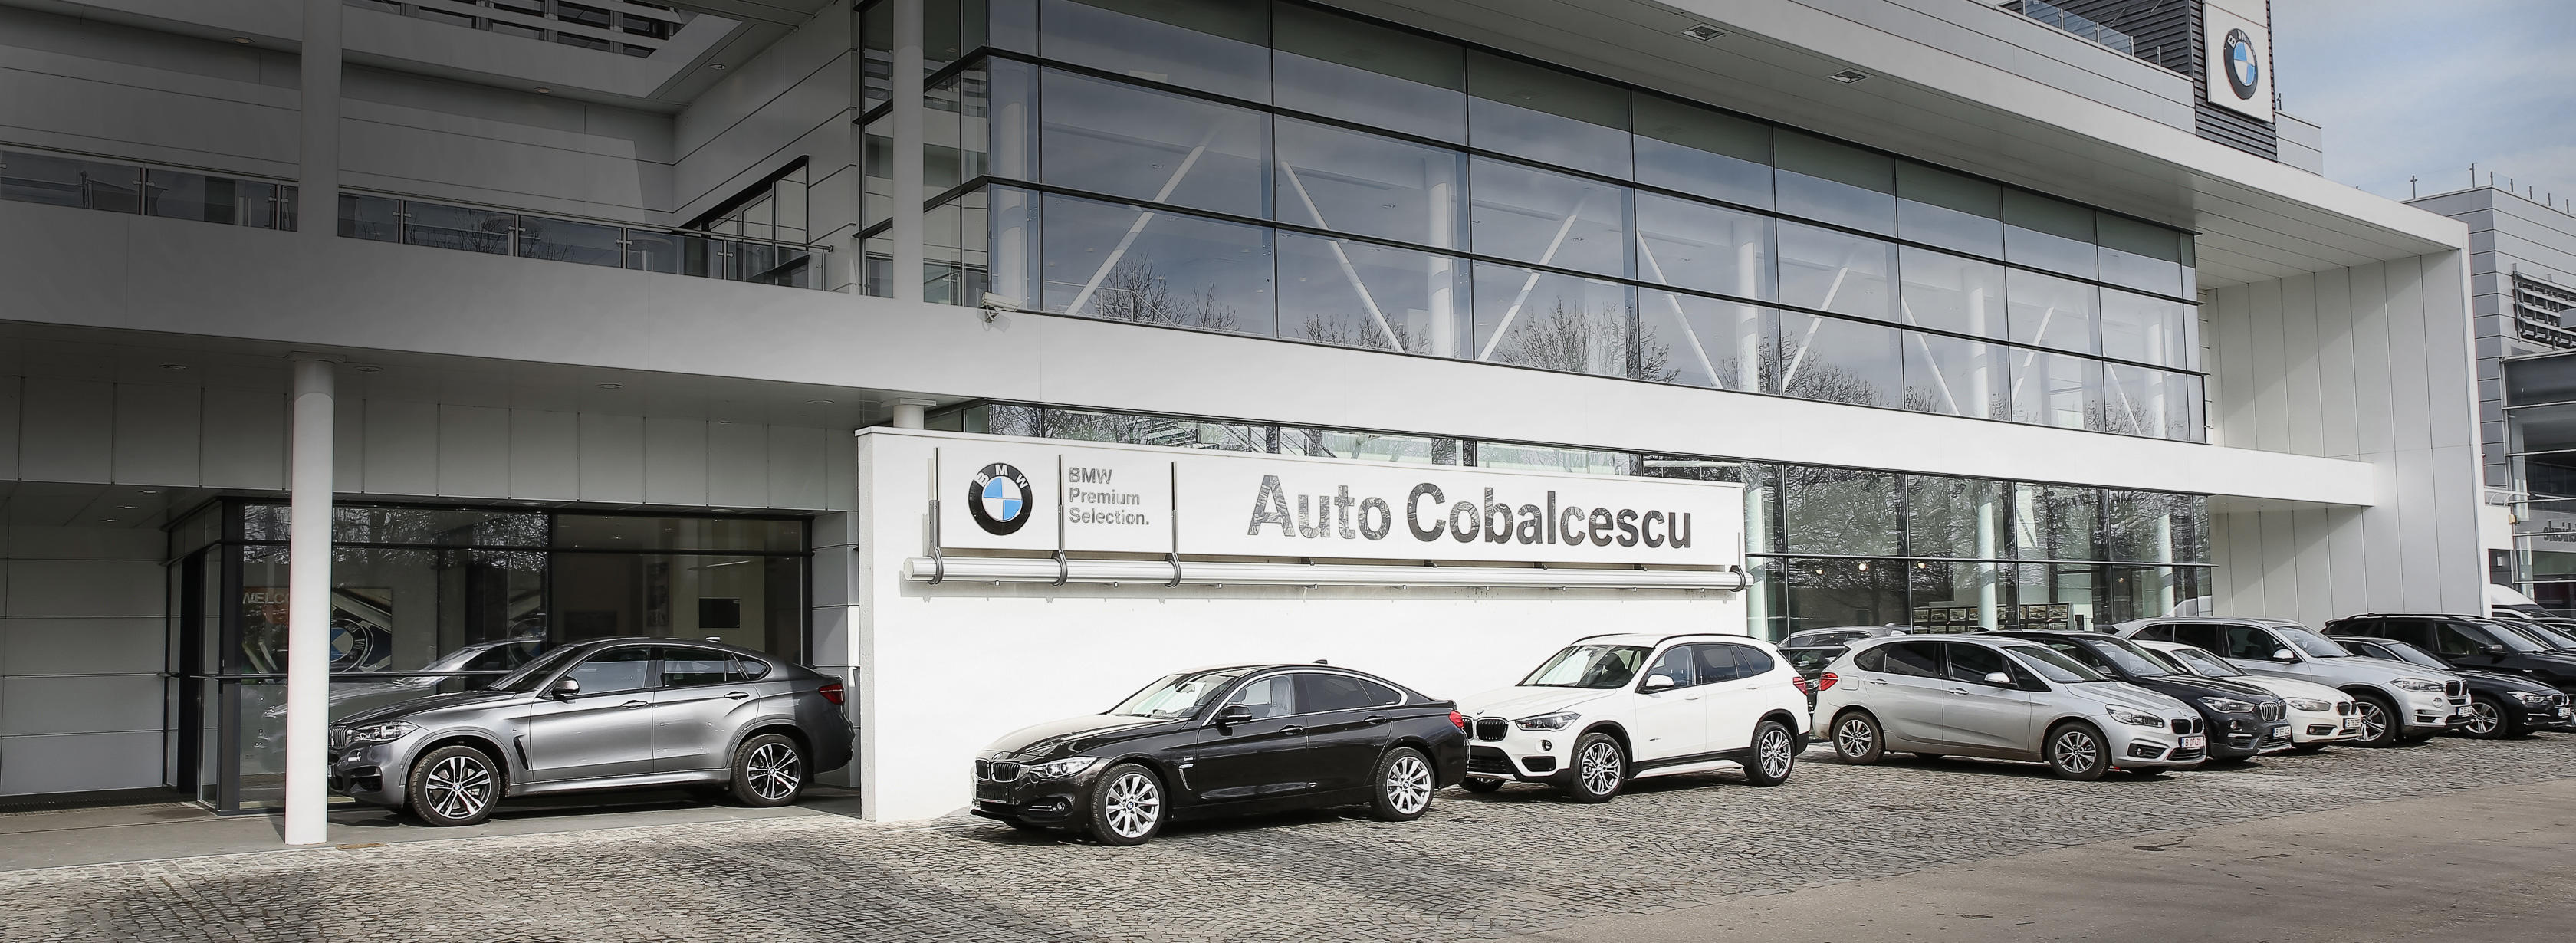 BMW Auto Cobalcescu S.R.L.